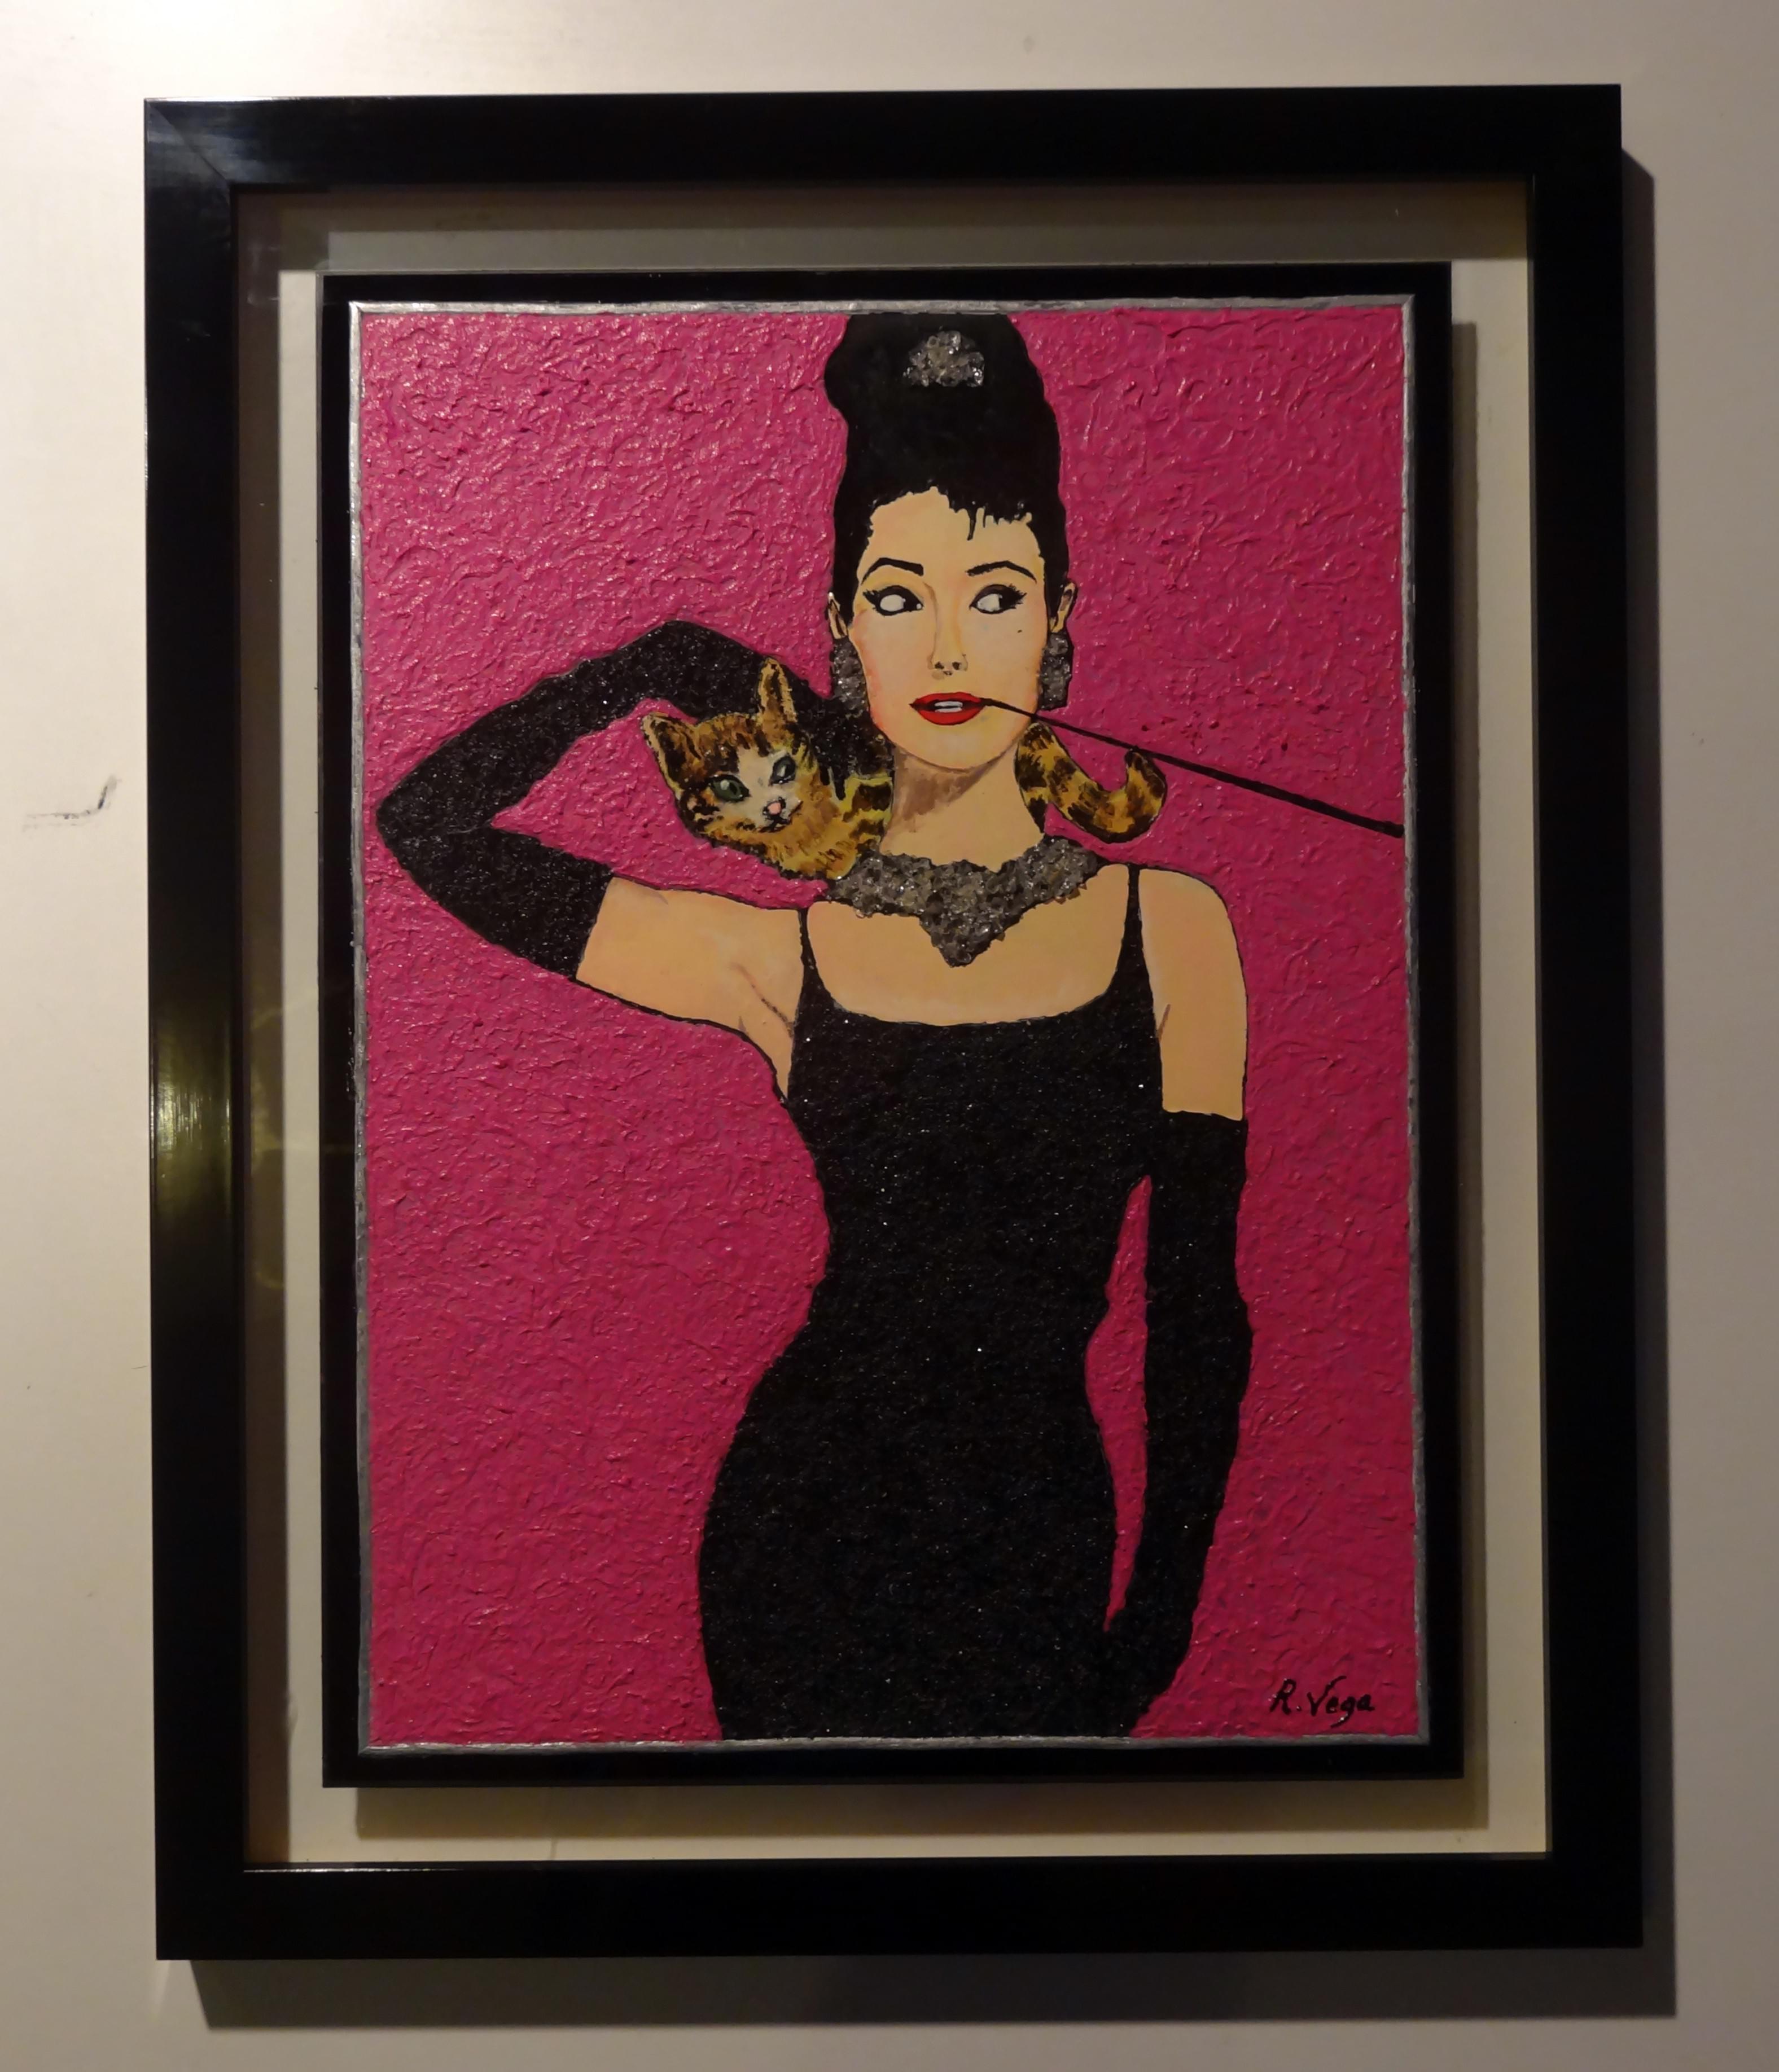 Audrey hepburn desayuno con diamantes rosa vega art - Audrey hepburn cuadros ...